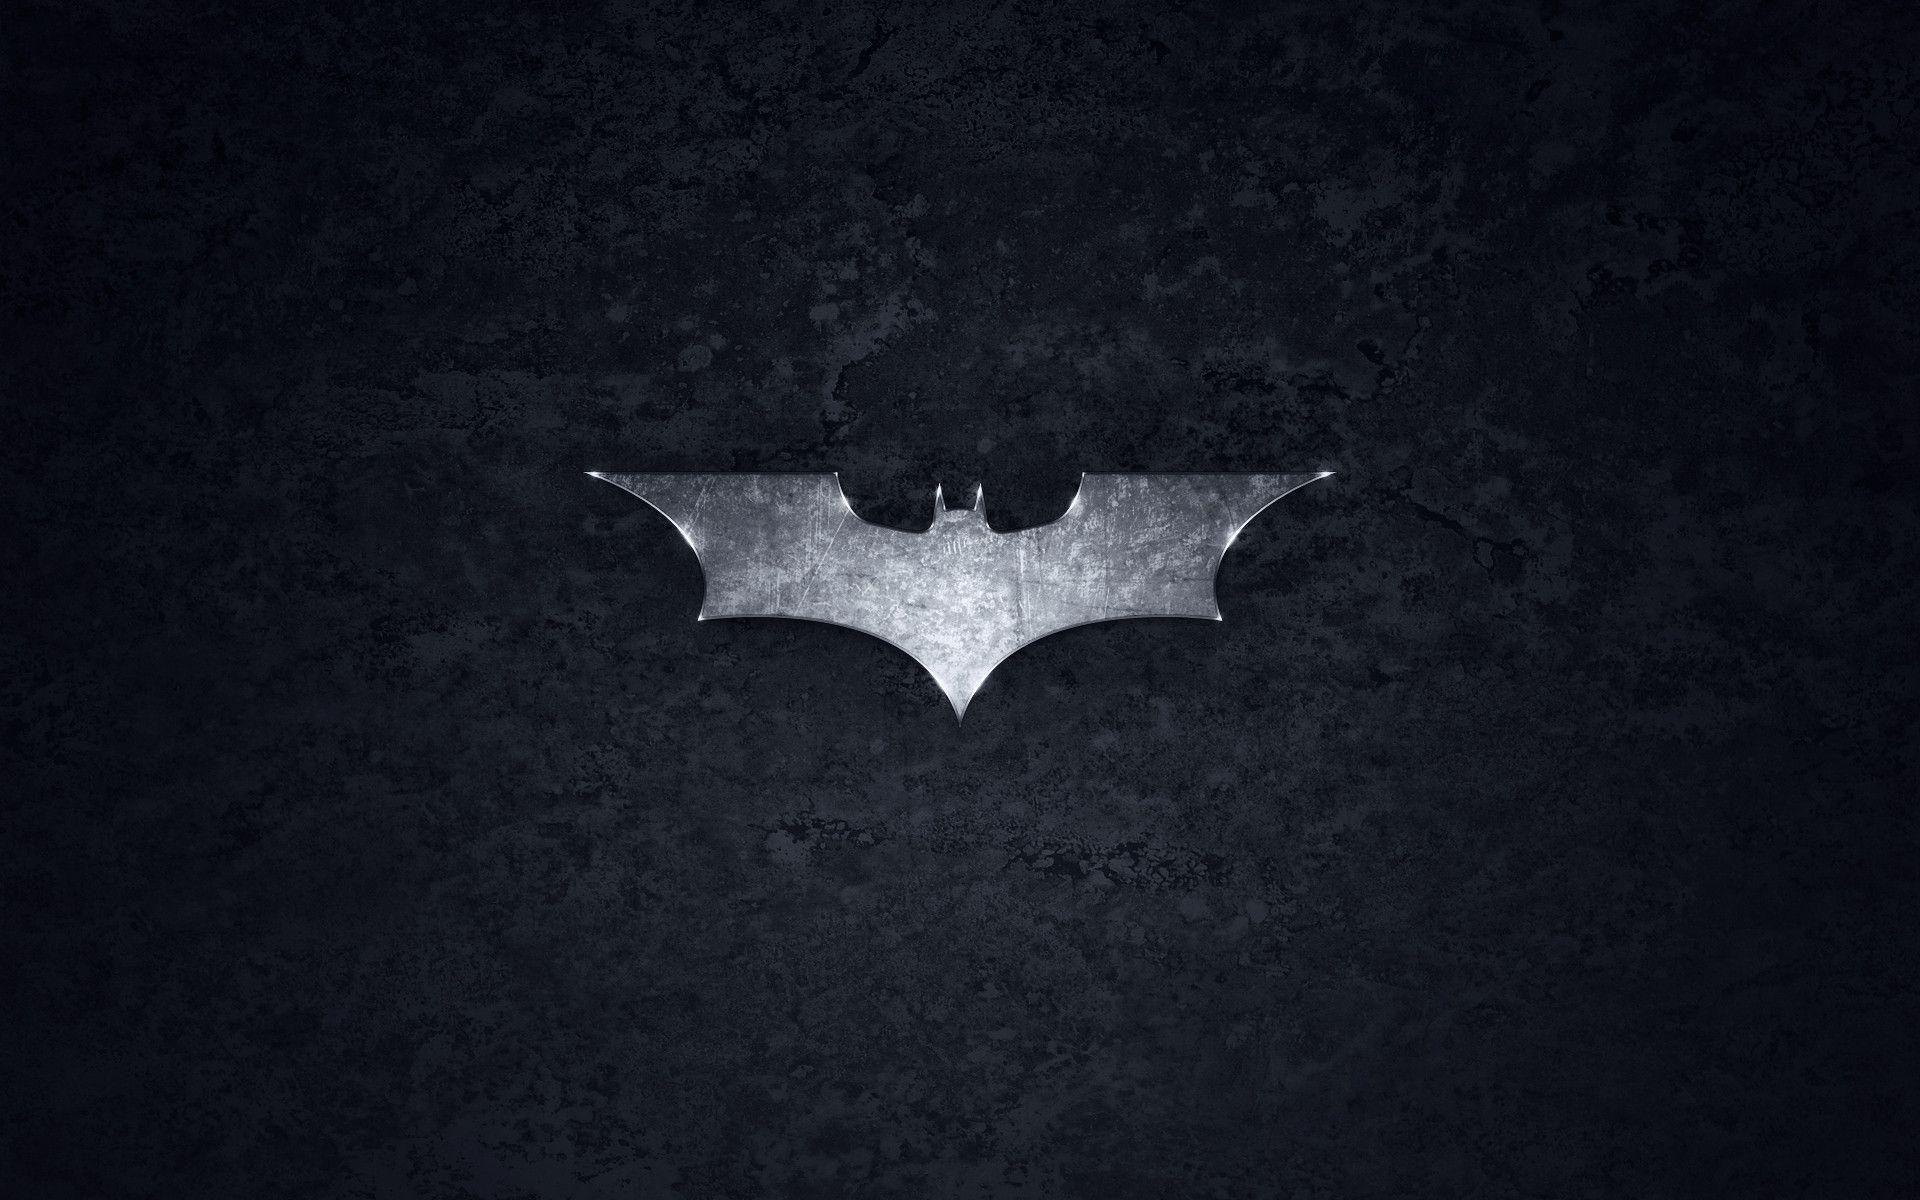 10 Top Batman Symbol Hd Wallpaper Full Hd 1920 1080 For Pc Desktop Batman Wallpaper Cool Batman Wallpapers Dark Knight Wallpaper